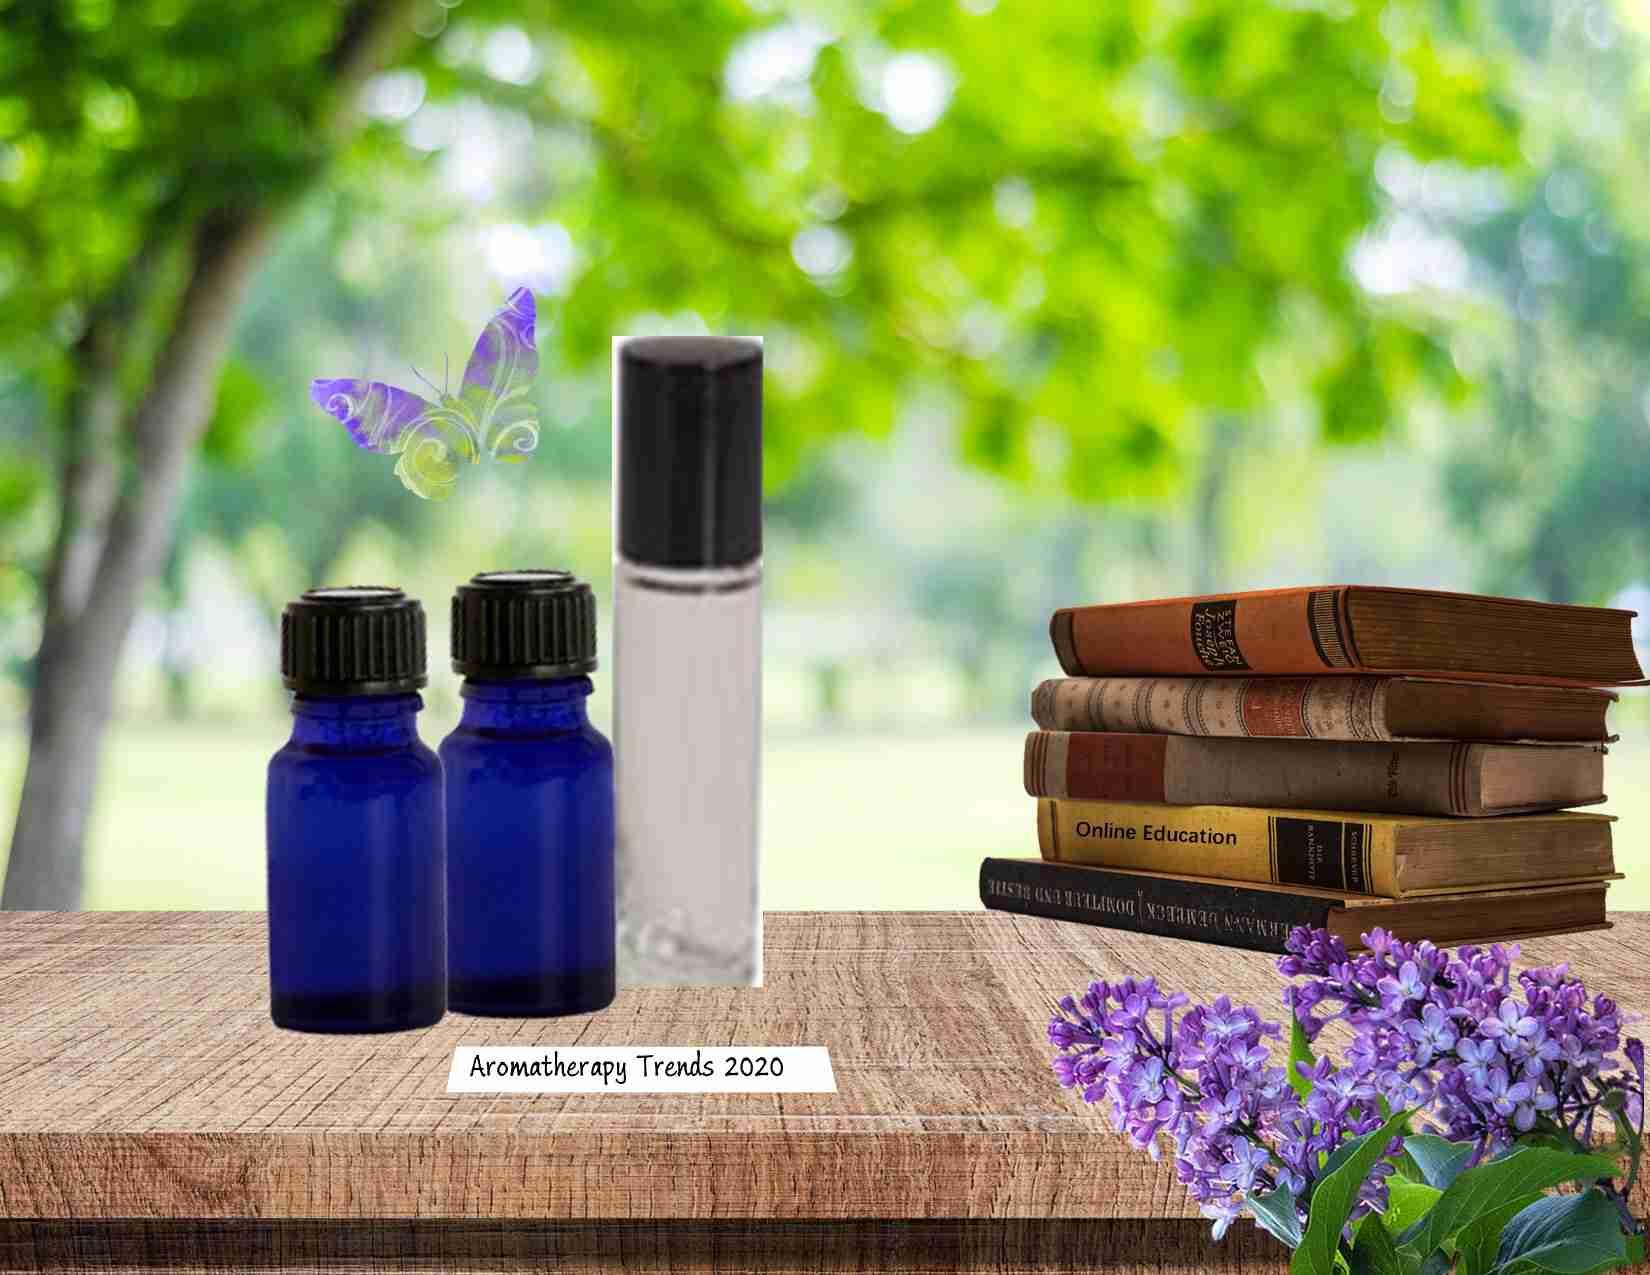 aromatherapy trends